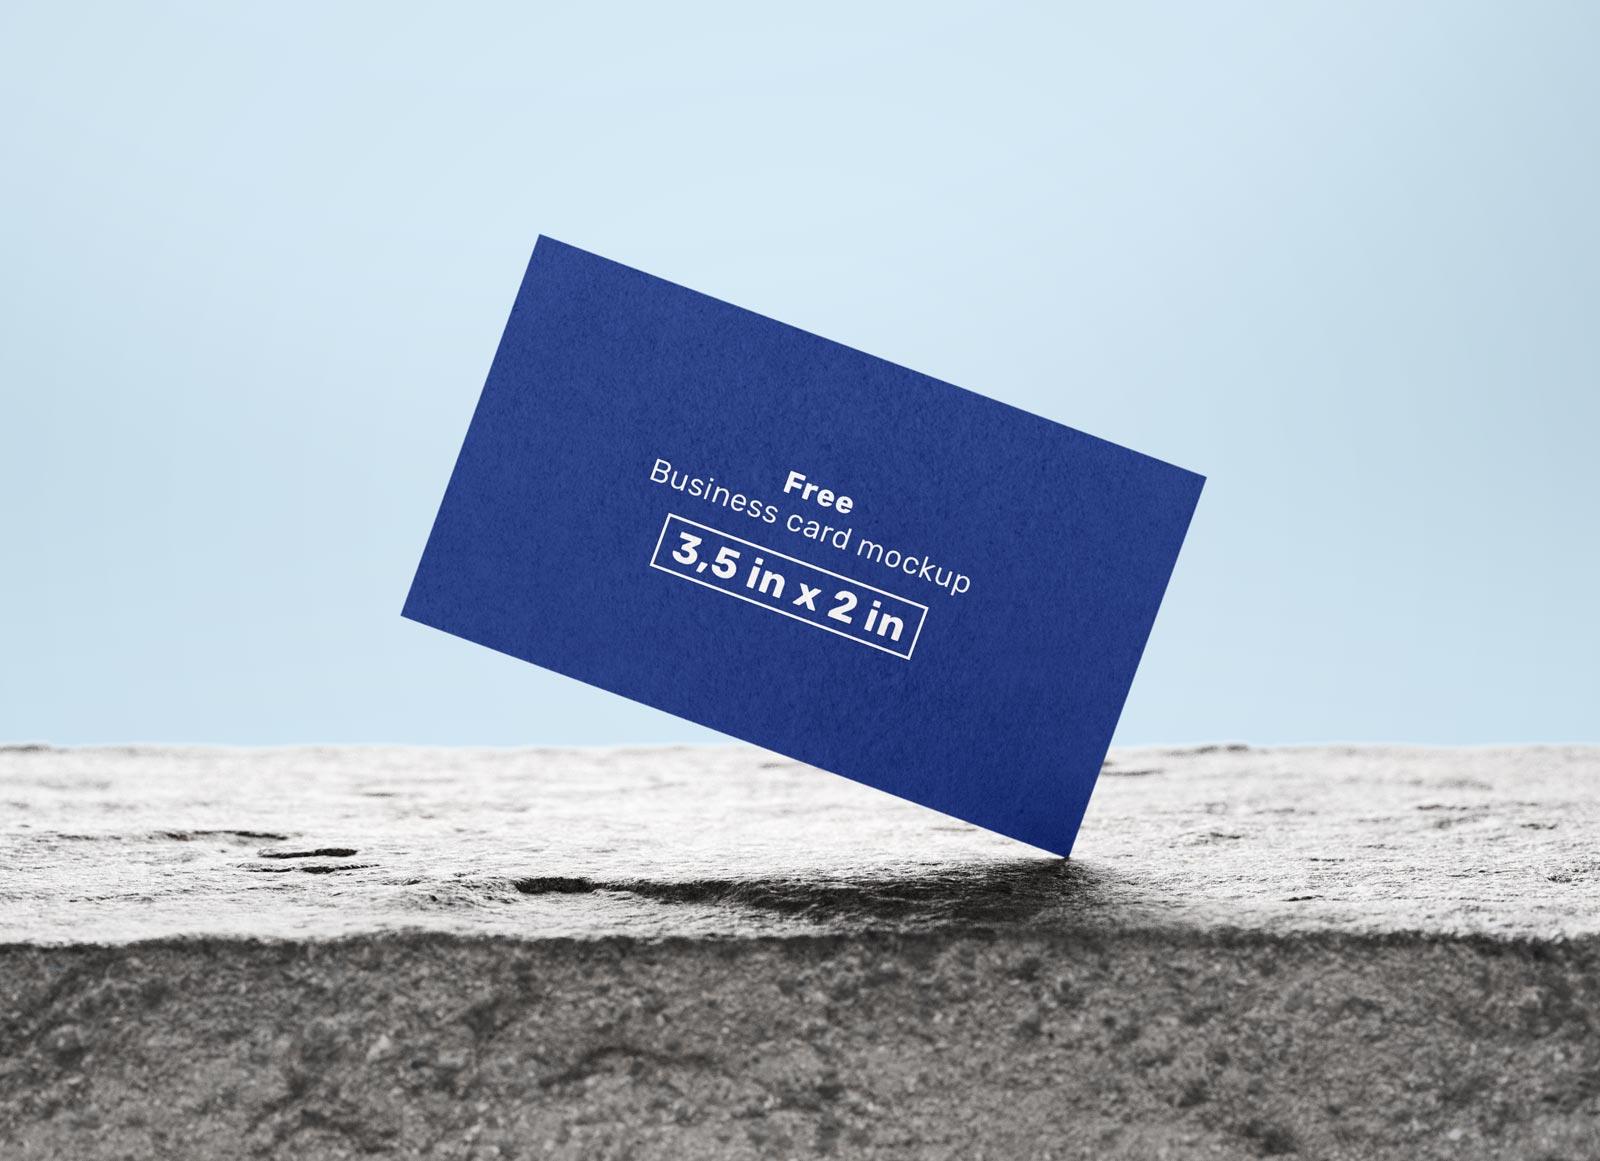 Free-Photo-Based-Business-Card-Mockup-PSD-Set